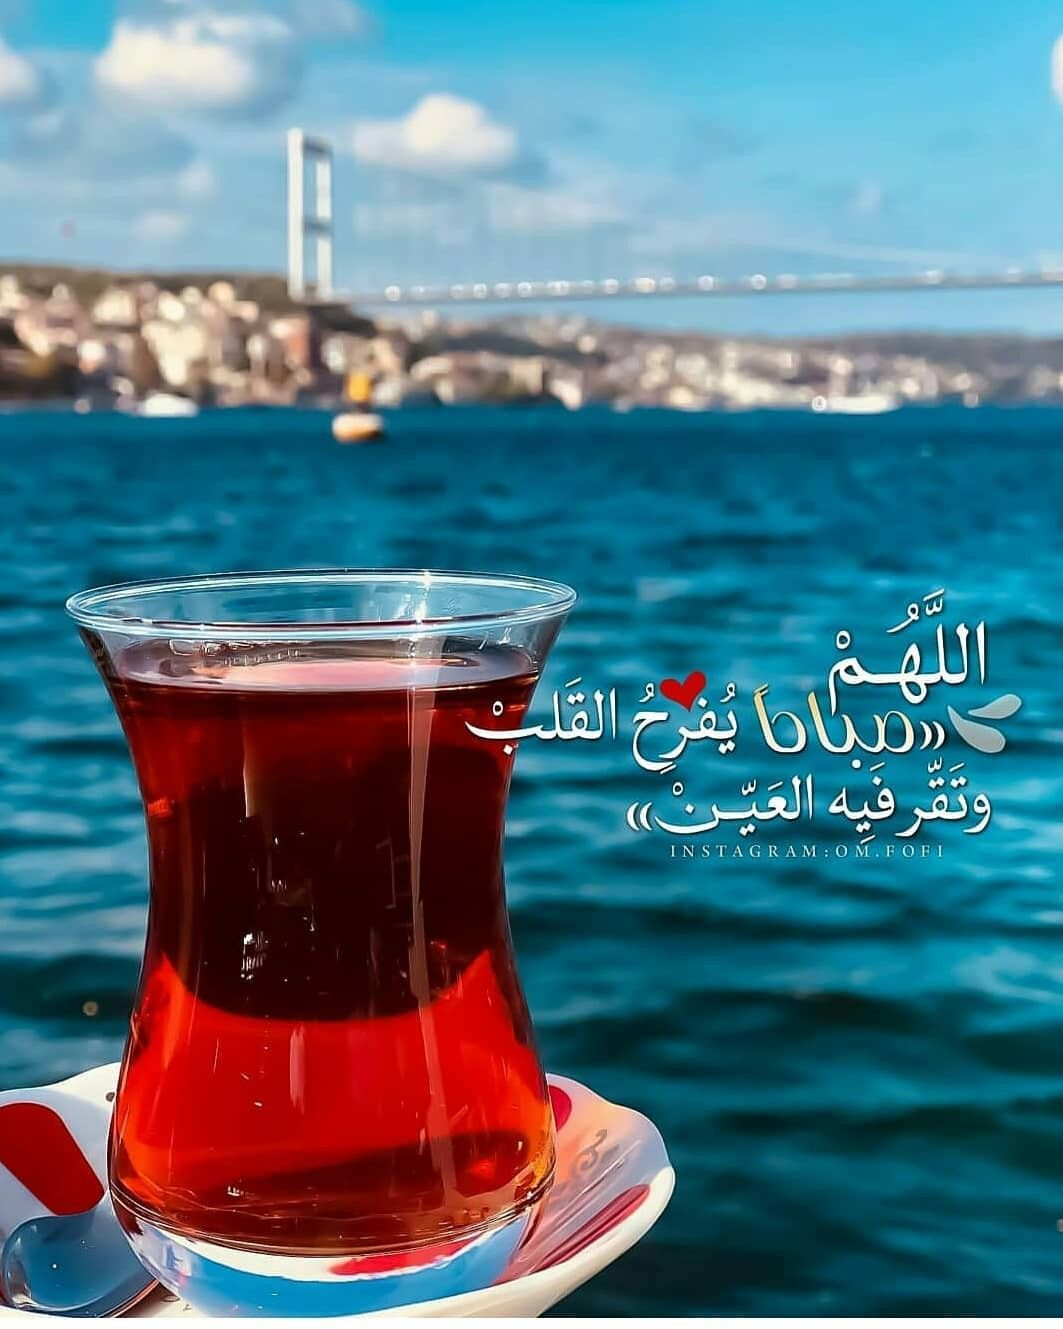 Pin By Aboodi Kassem On Morning Greeting In 2021 Morning Greeting Greetings Instagram